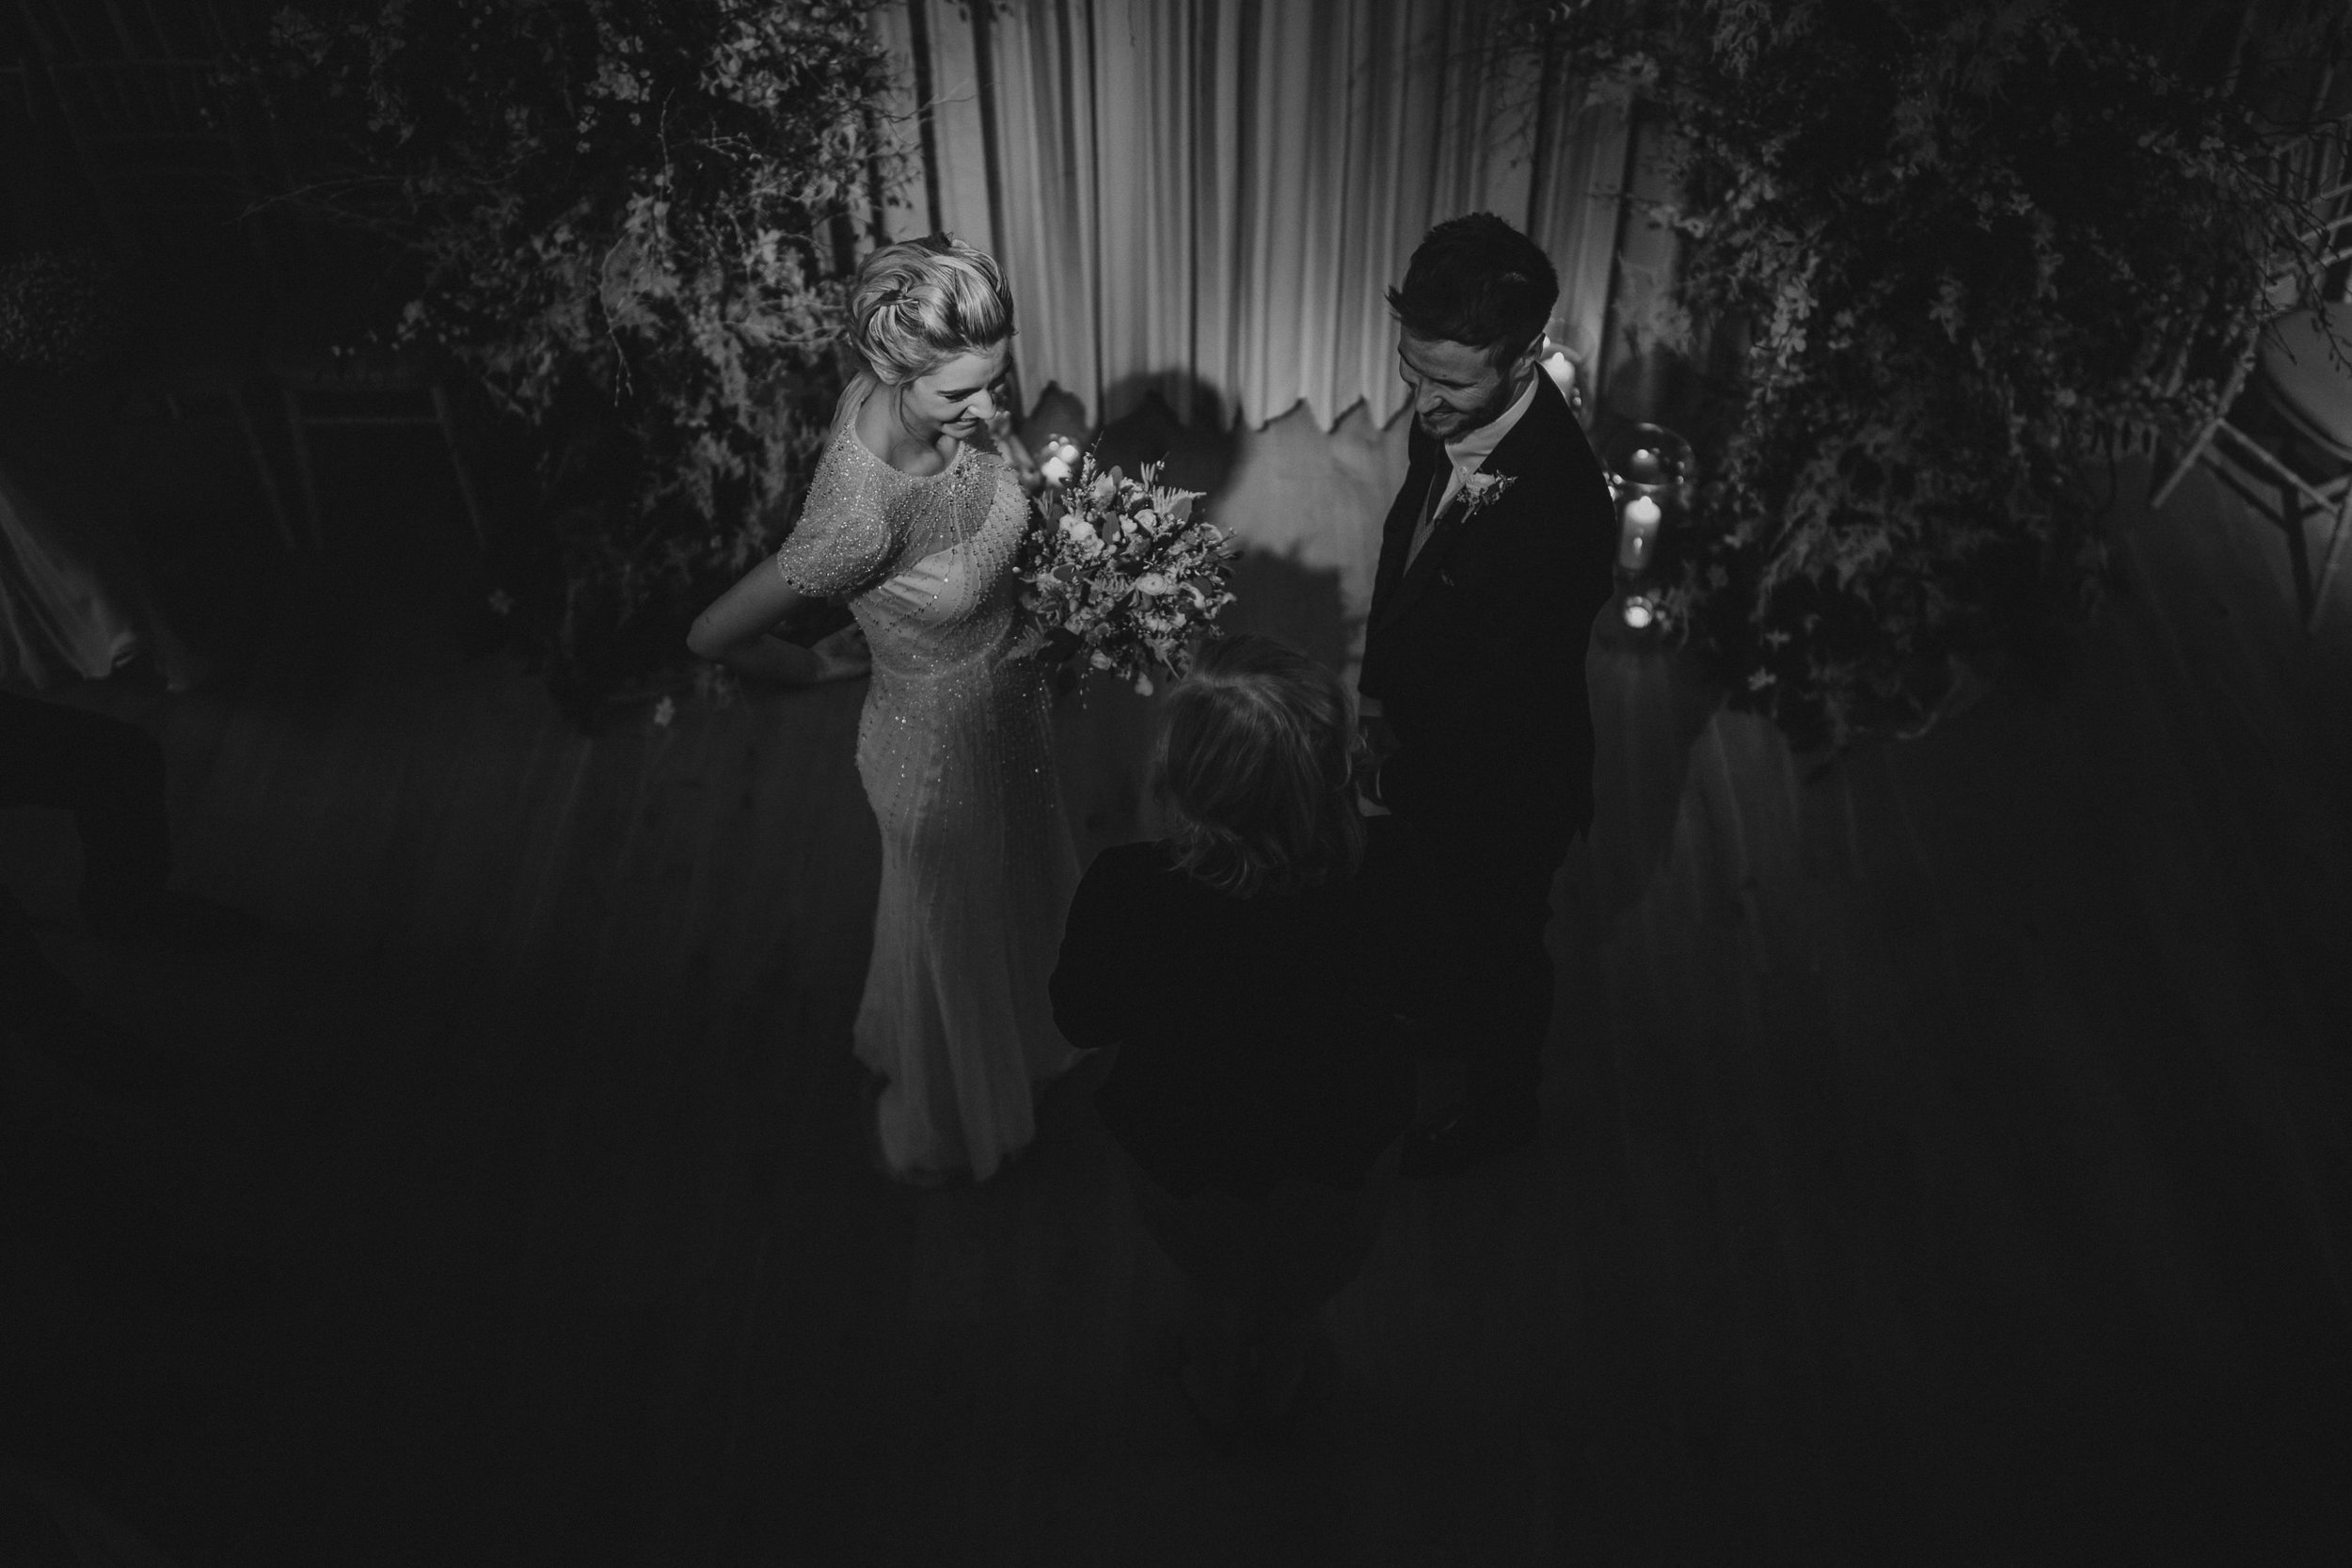 London_wedding_photographer_gione_da_silva_carelle_paul144.jpg